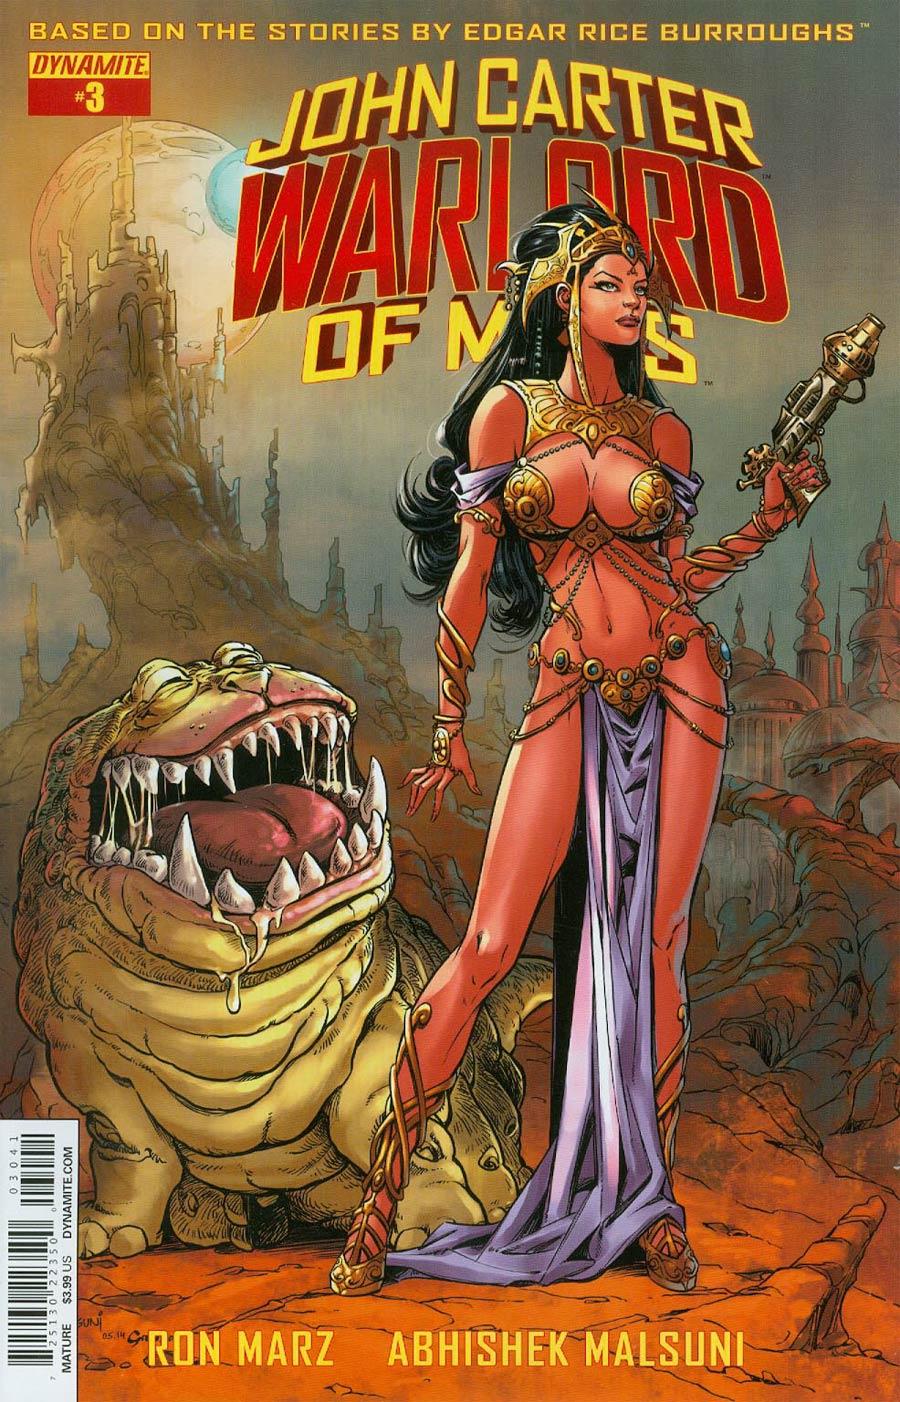 John Carter Warlord Of Mars Vol 2 #3 Cover D Variant Abhishek Malsuni Subscription Cover